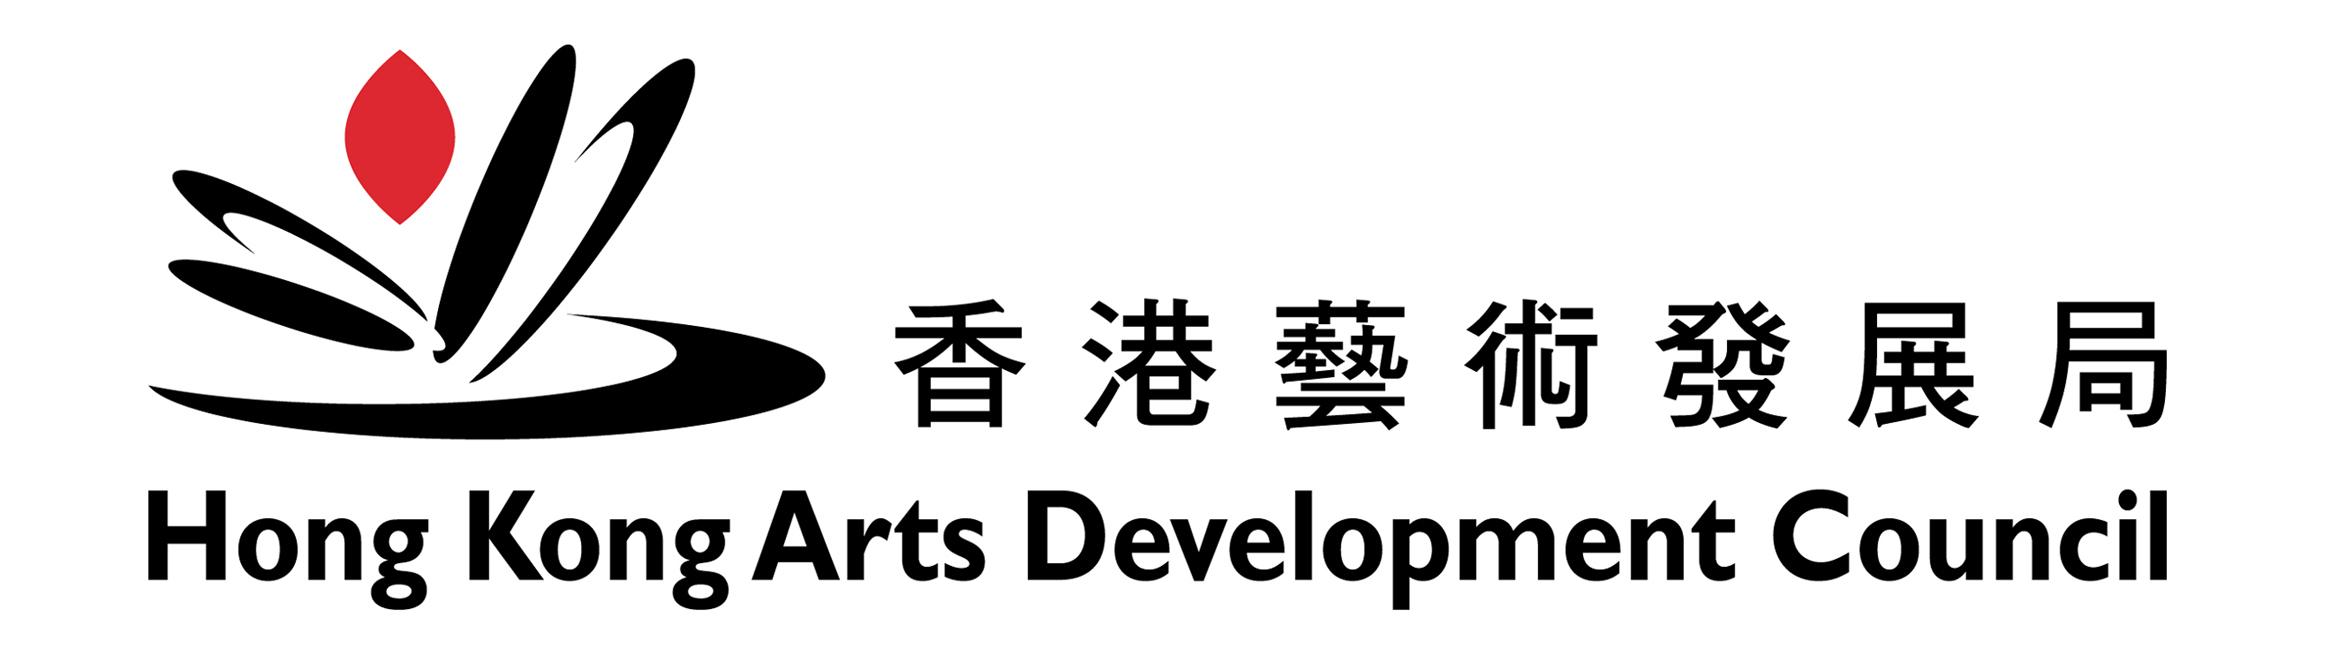 hkadc_logo_2016.jpg